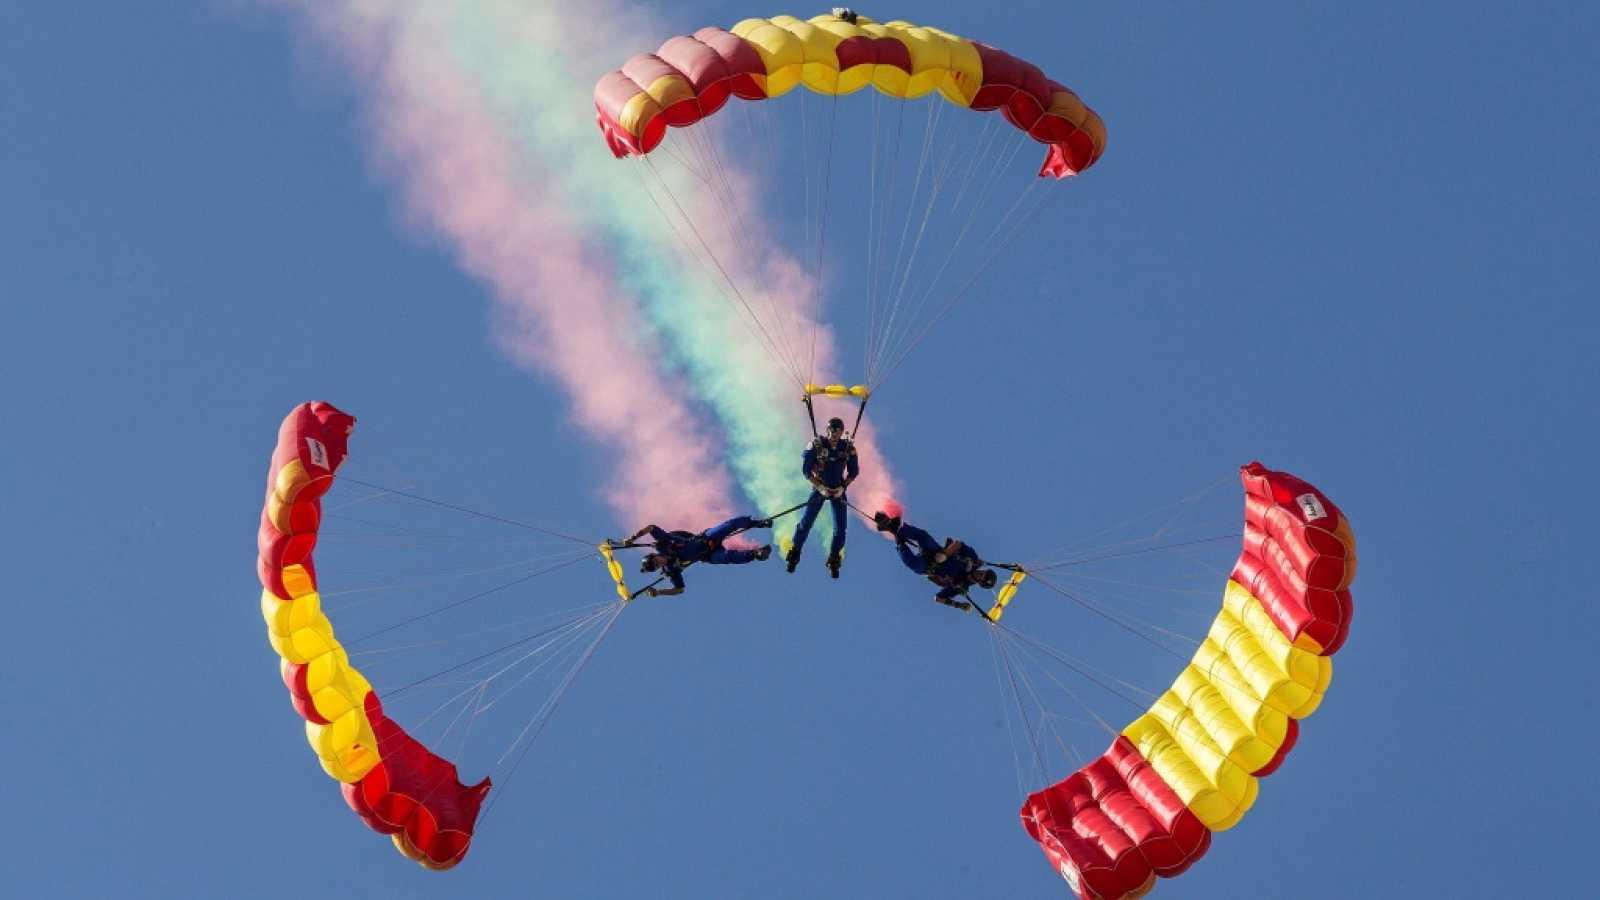 Festival Aéreo Internacional 75 Aniversario AGA - San Javier (Murcia) - ver ahora